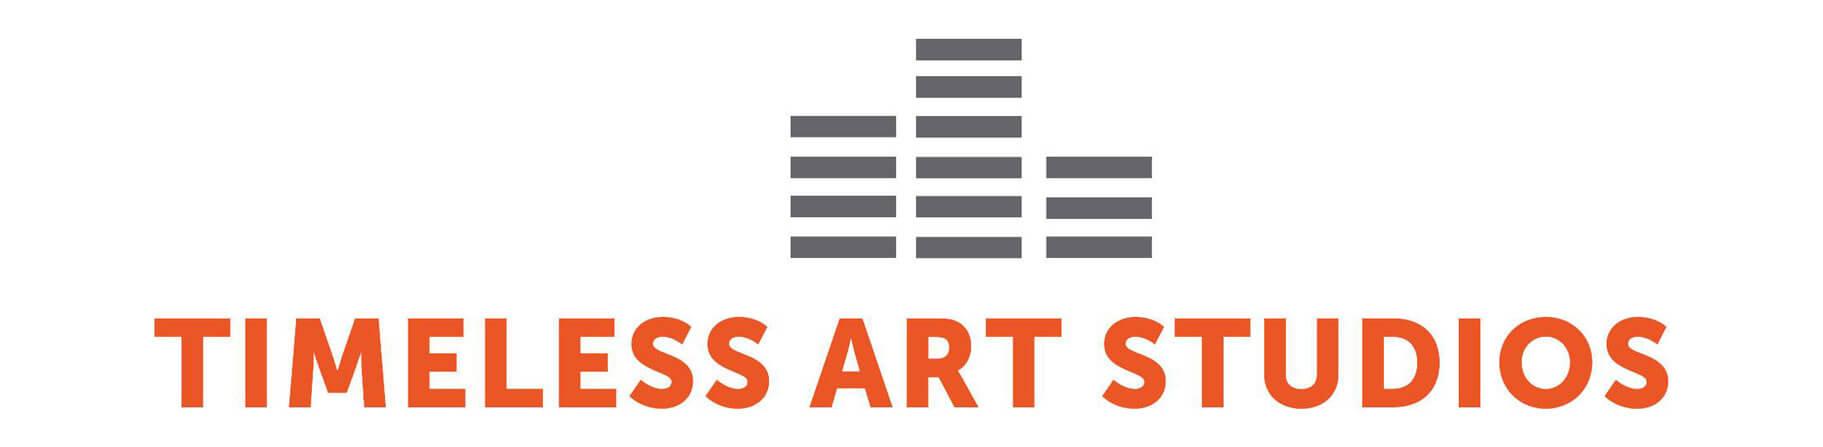 Timles Art Studio Logo